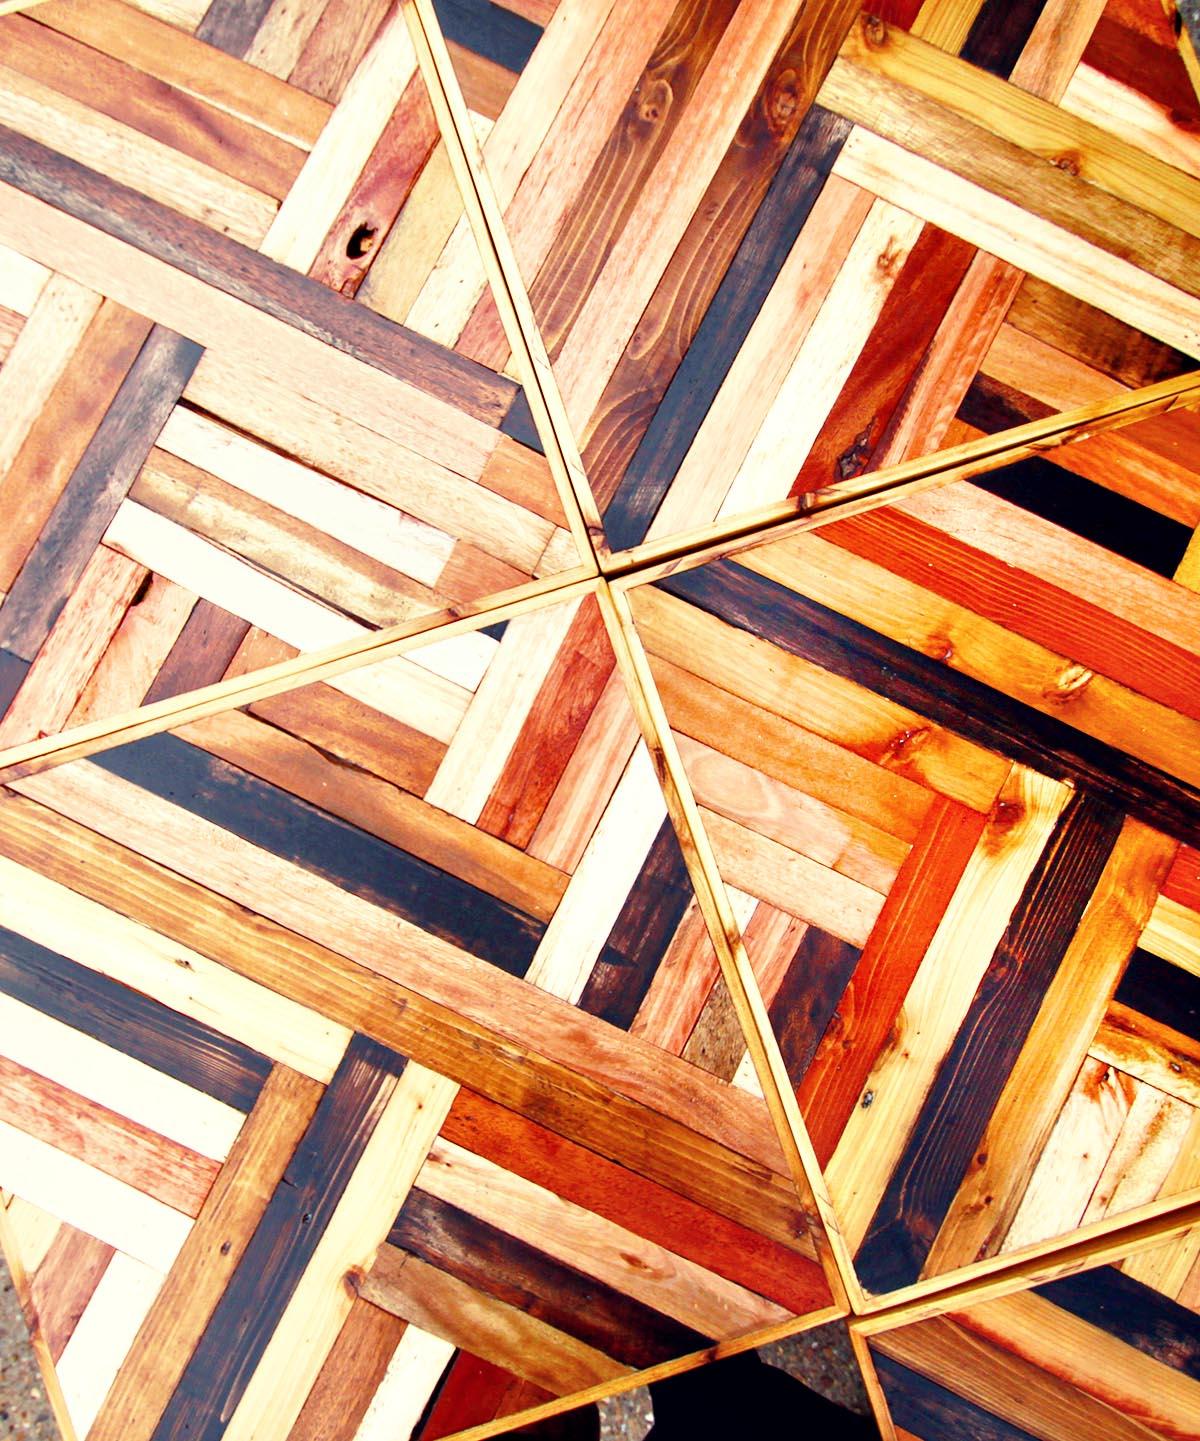 Modular, reclaimed-wood tables